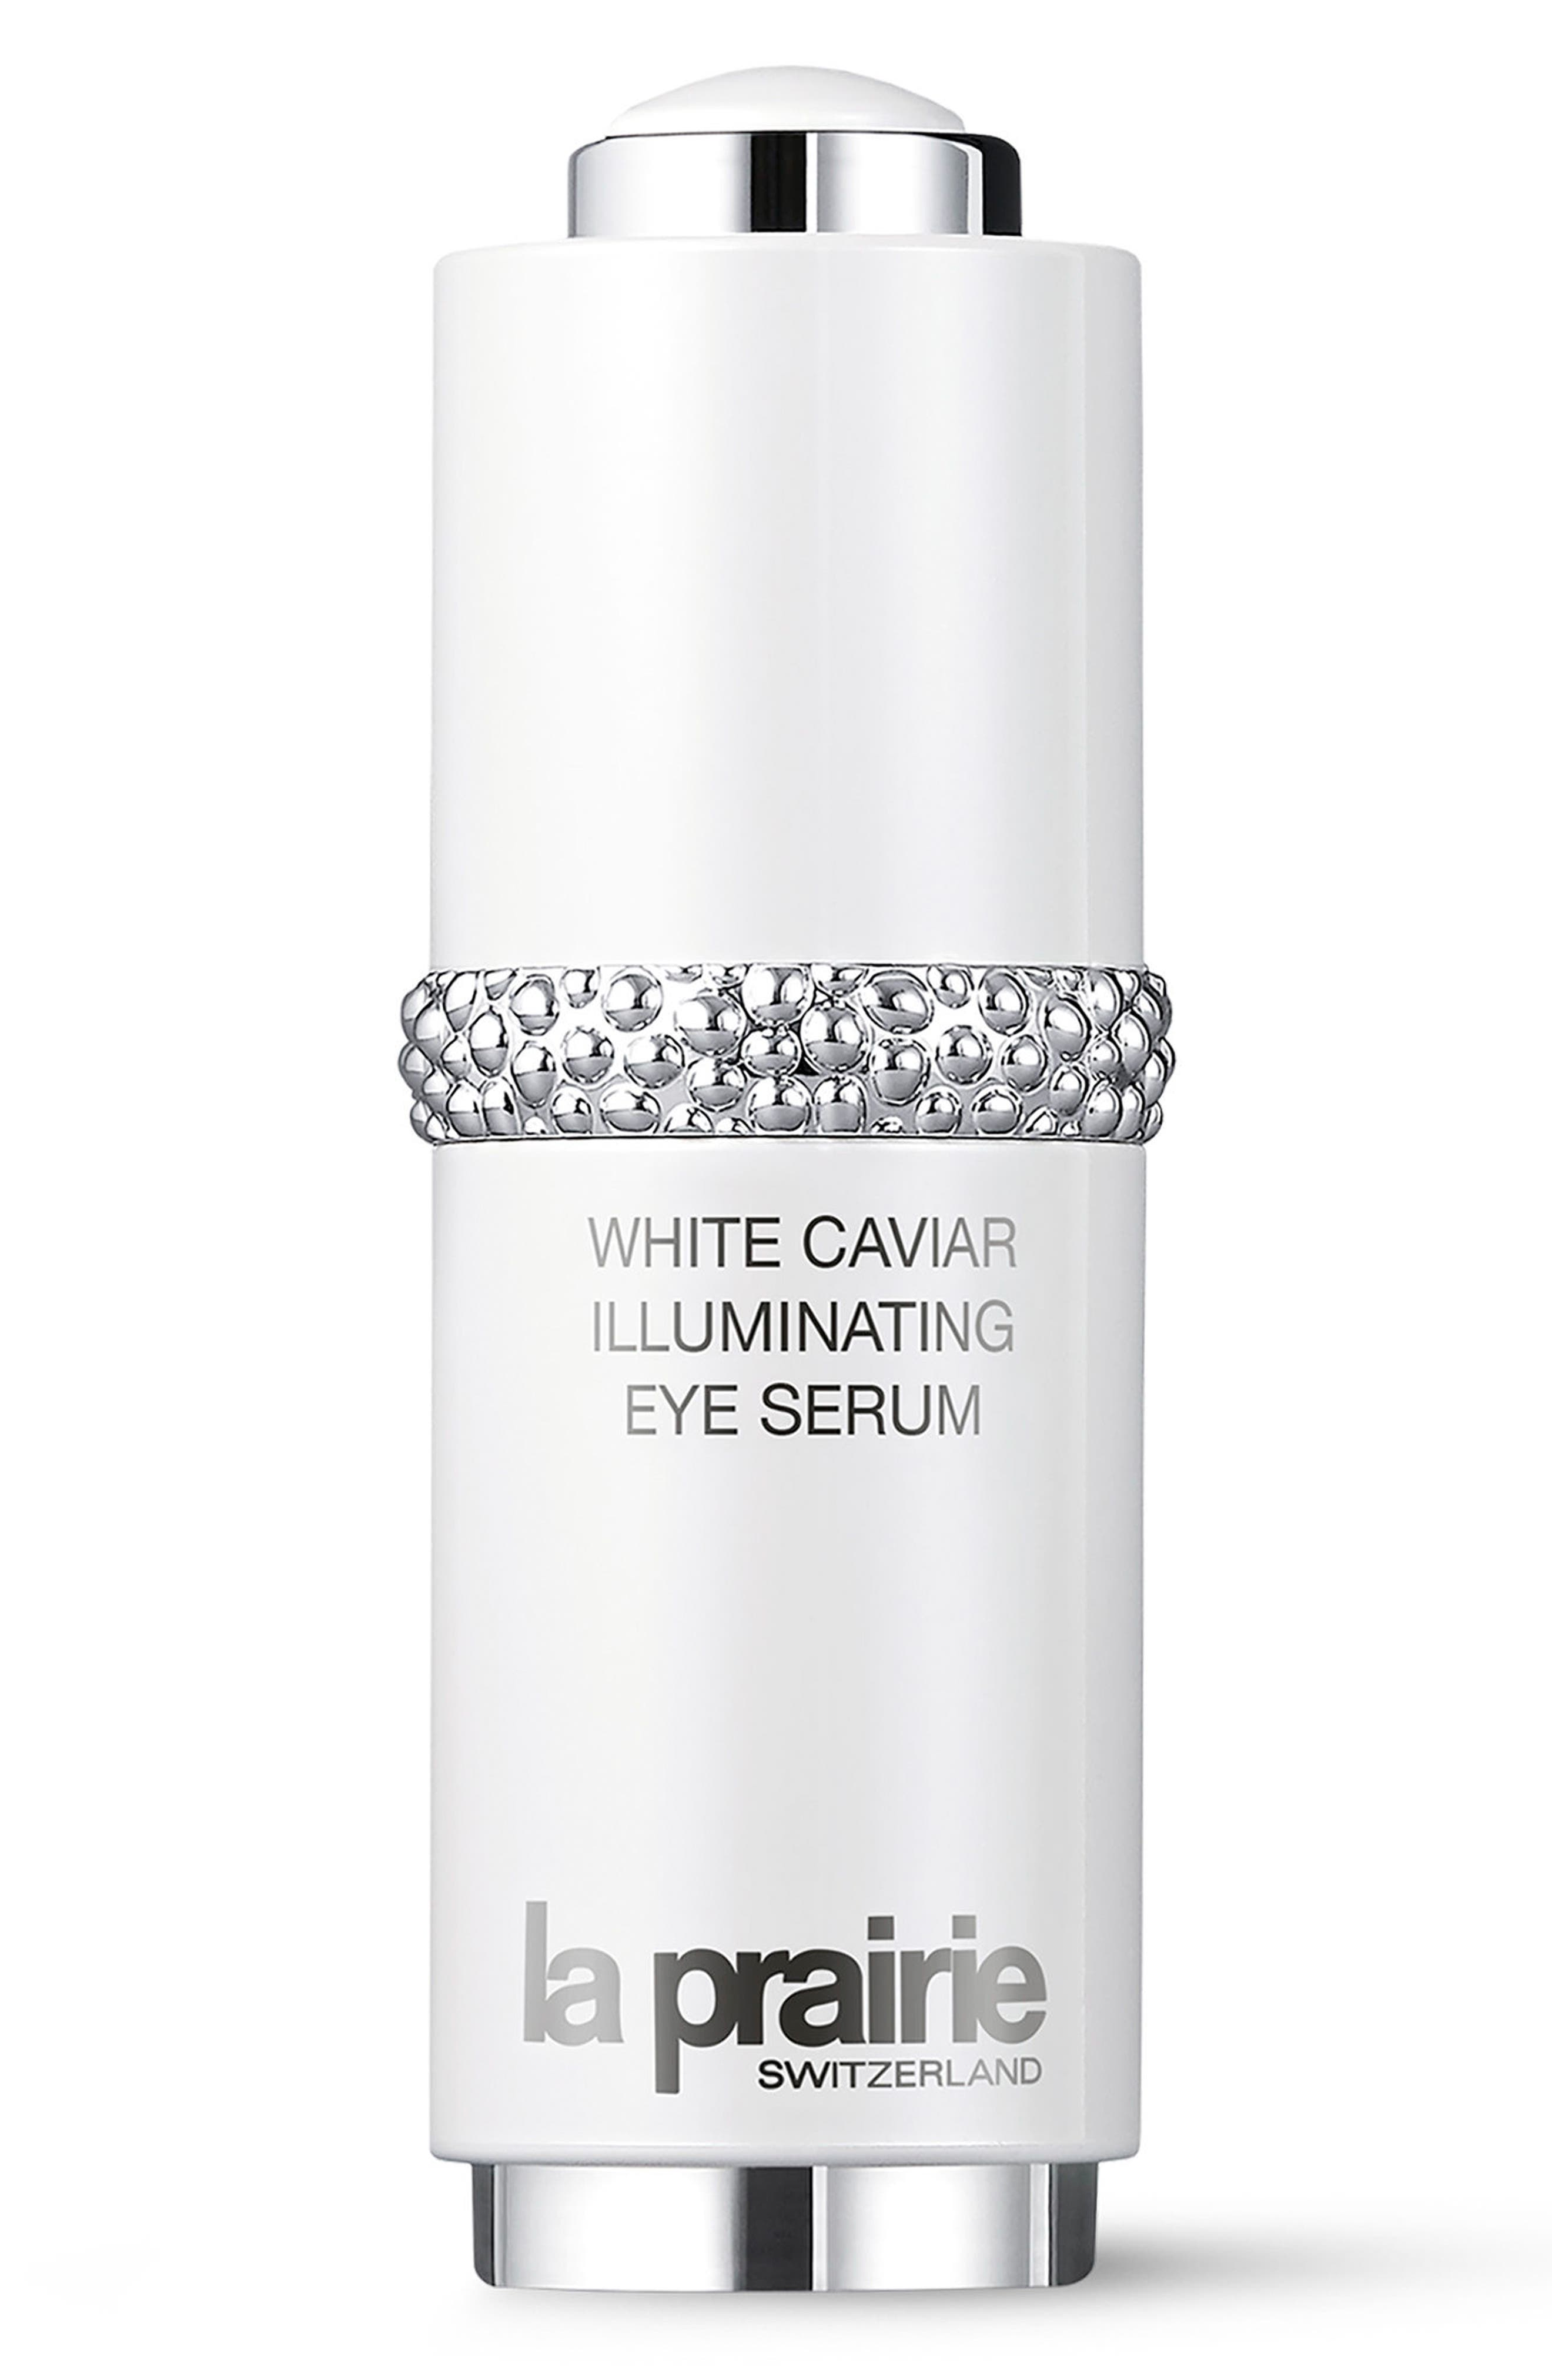 Alternate Image 1 Selected - La Prairie 'White Caviar' Illuminating Eye Serum